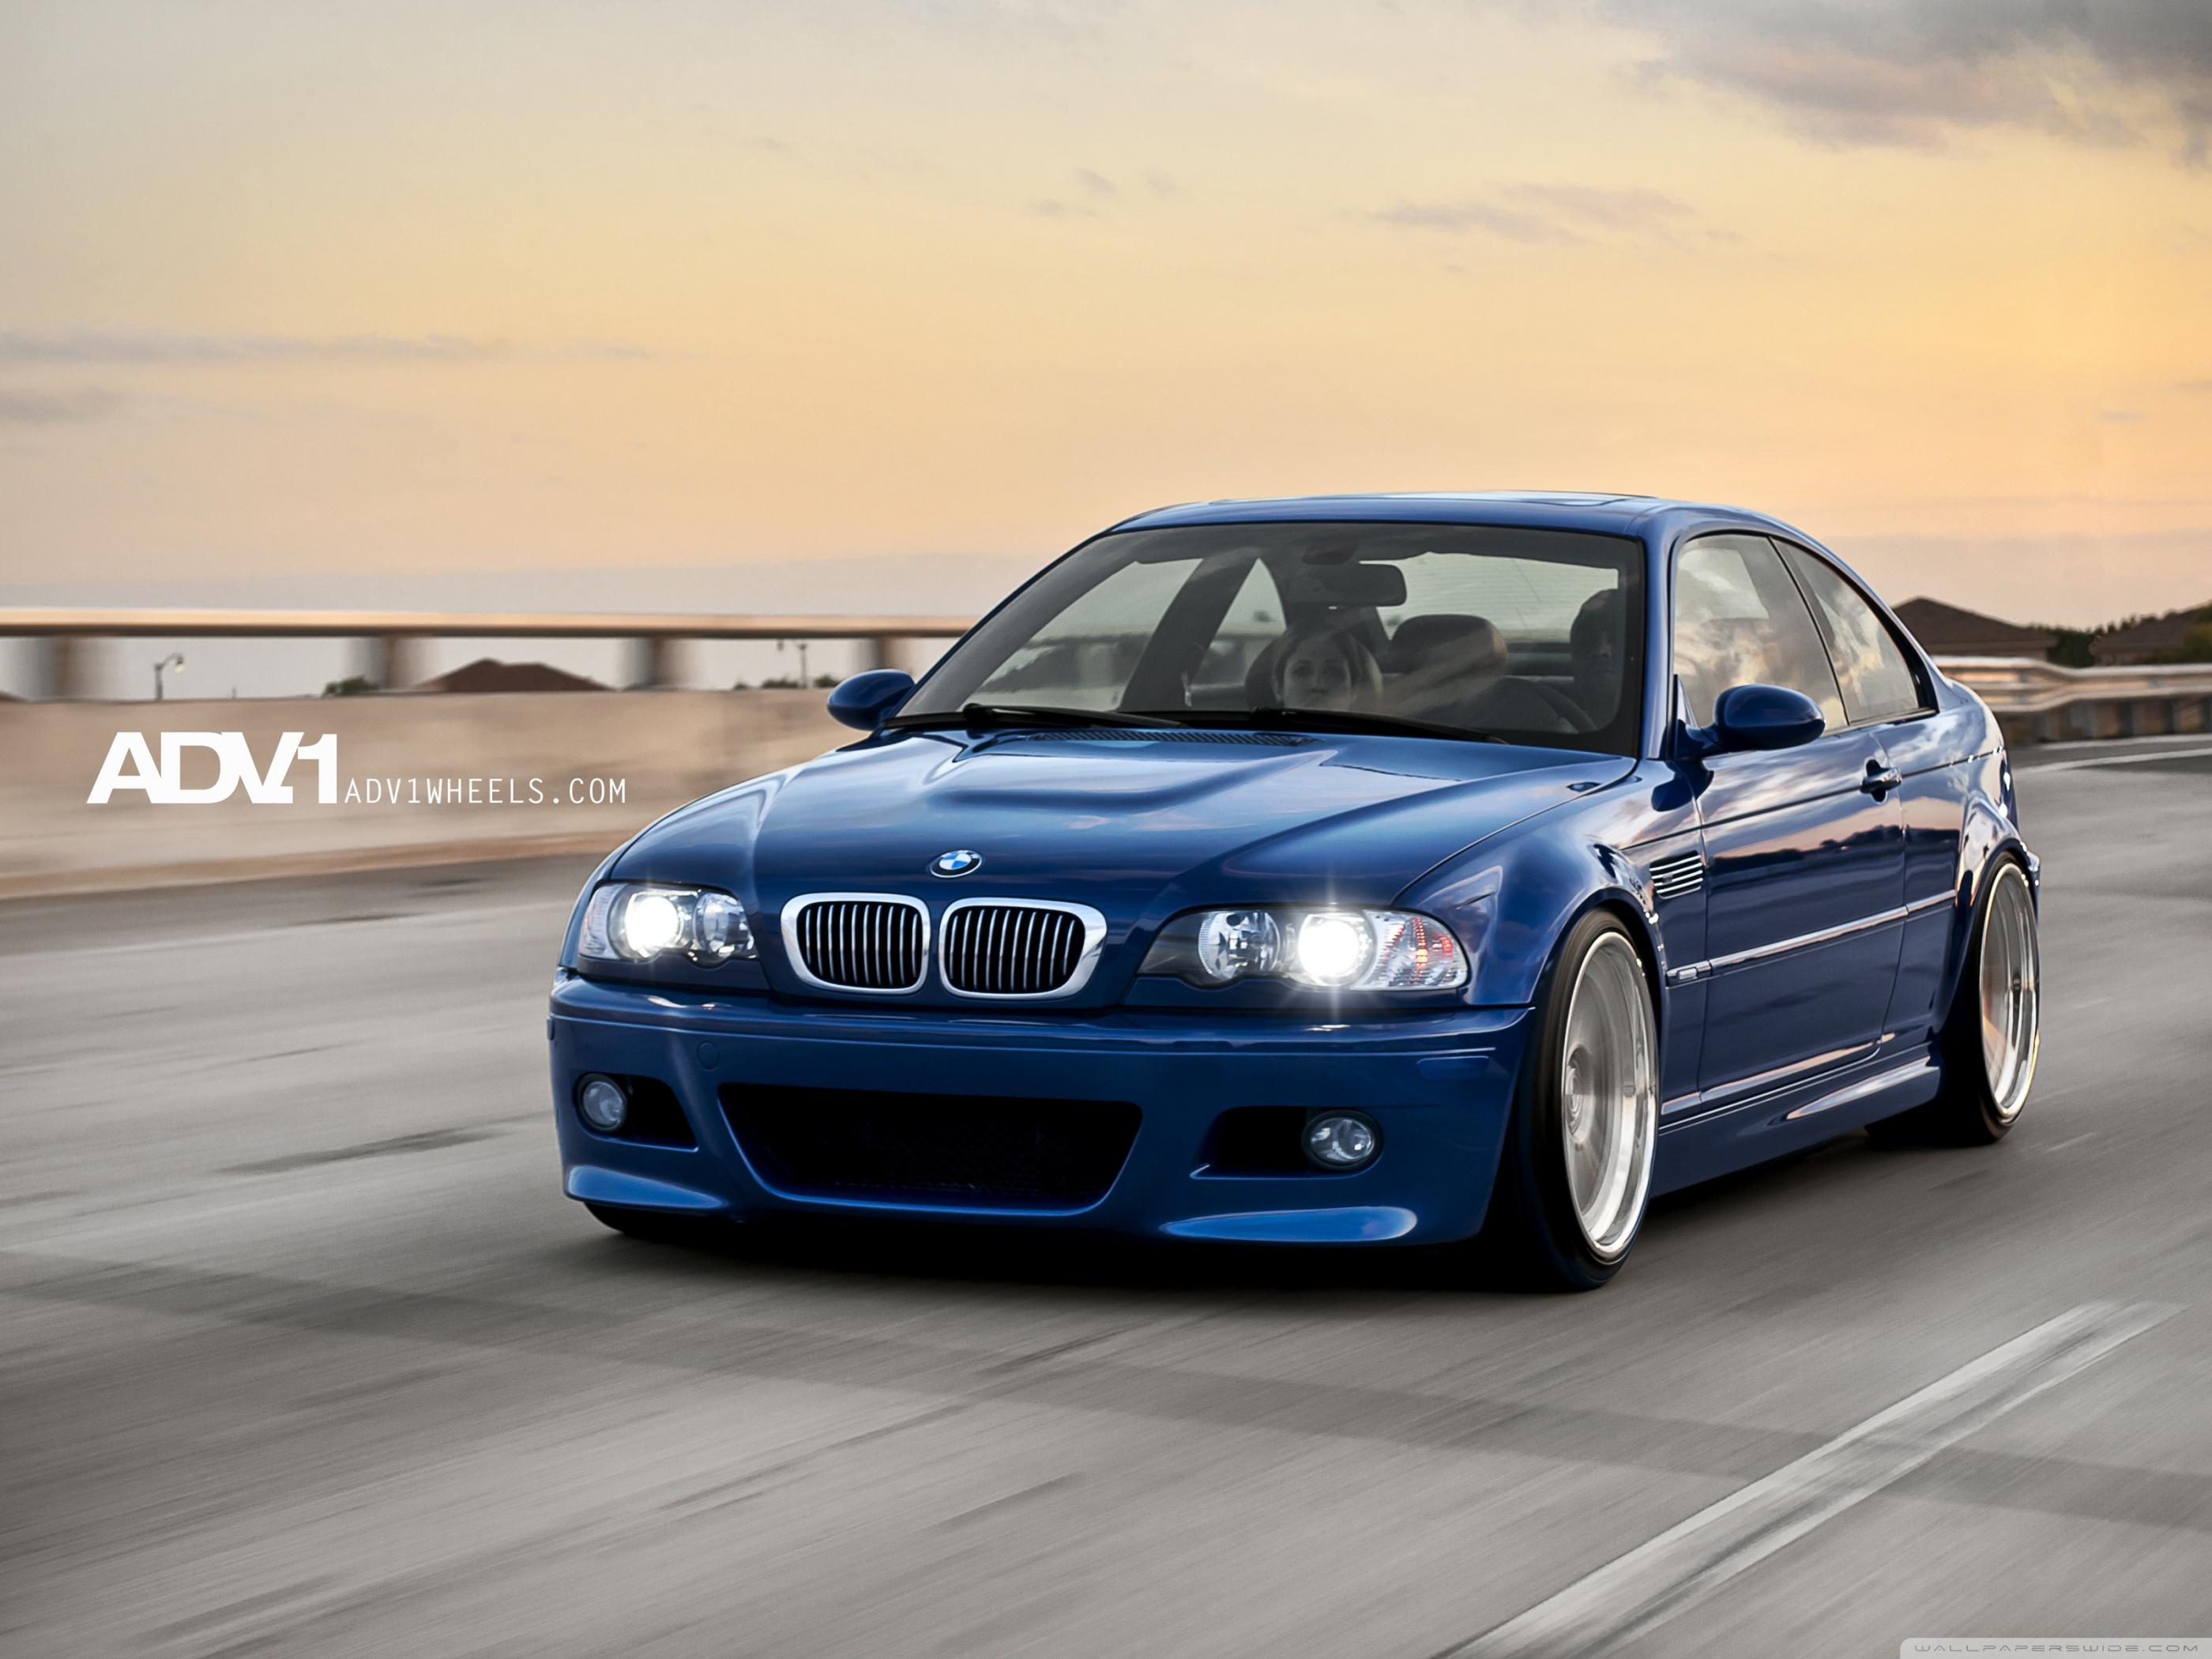 Blue BMW Wallpaper